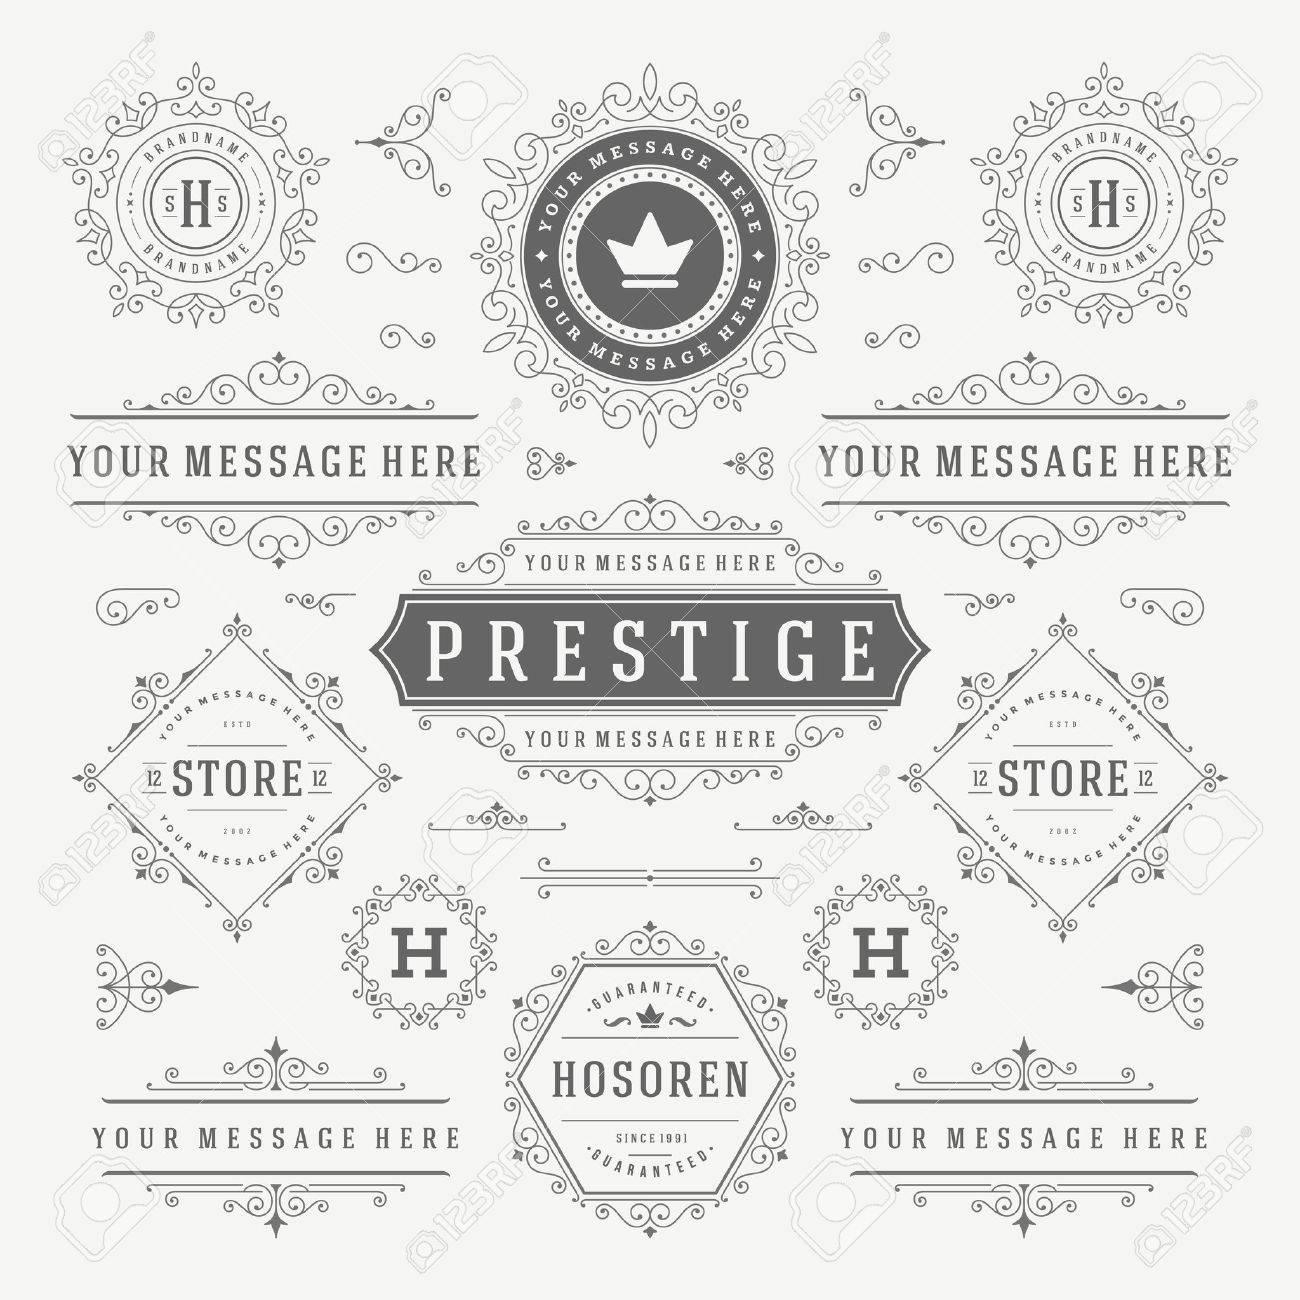 Flat line Digital Marketing Concept Vector illustration. Modern thin linear stroke vector icons. - 51466534